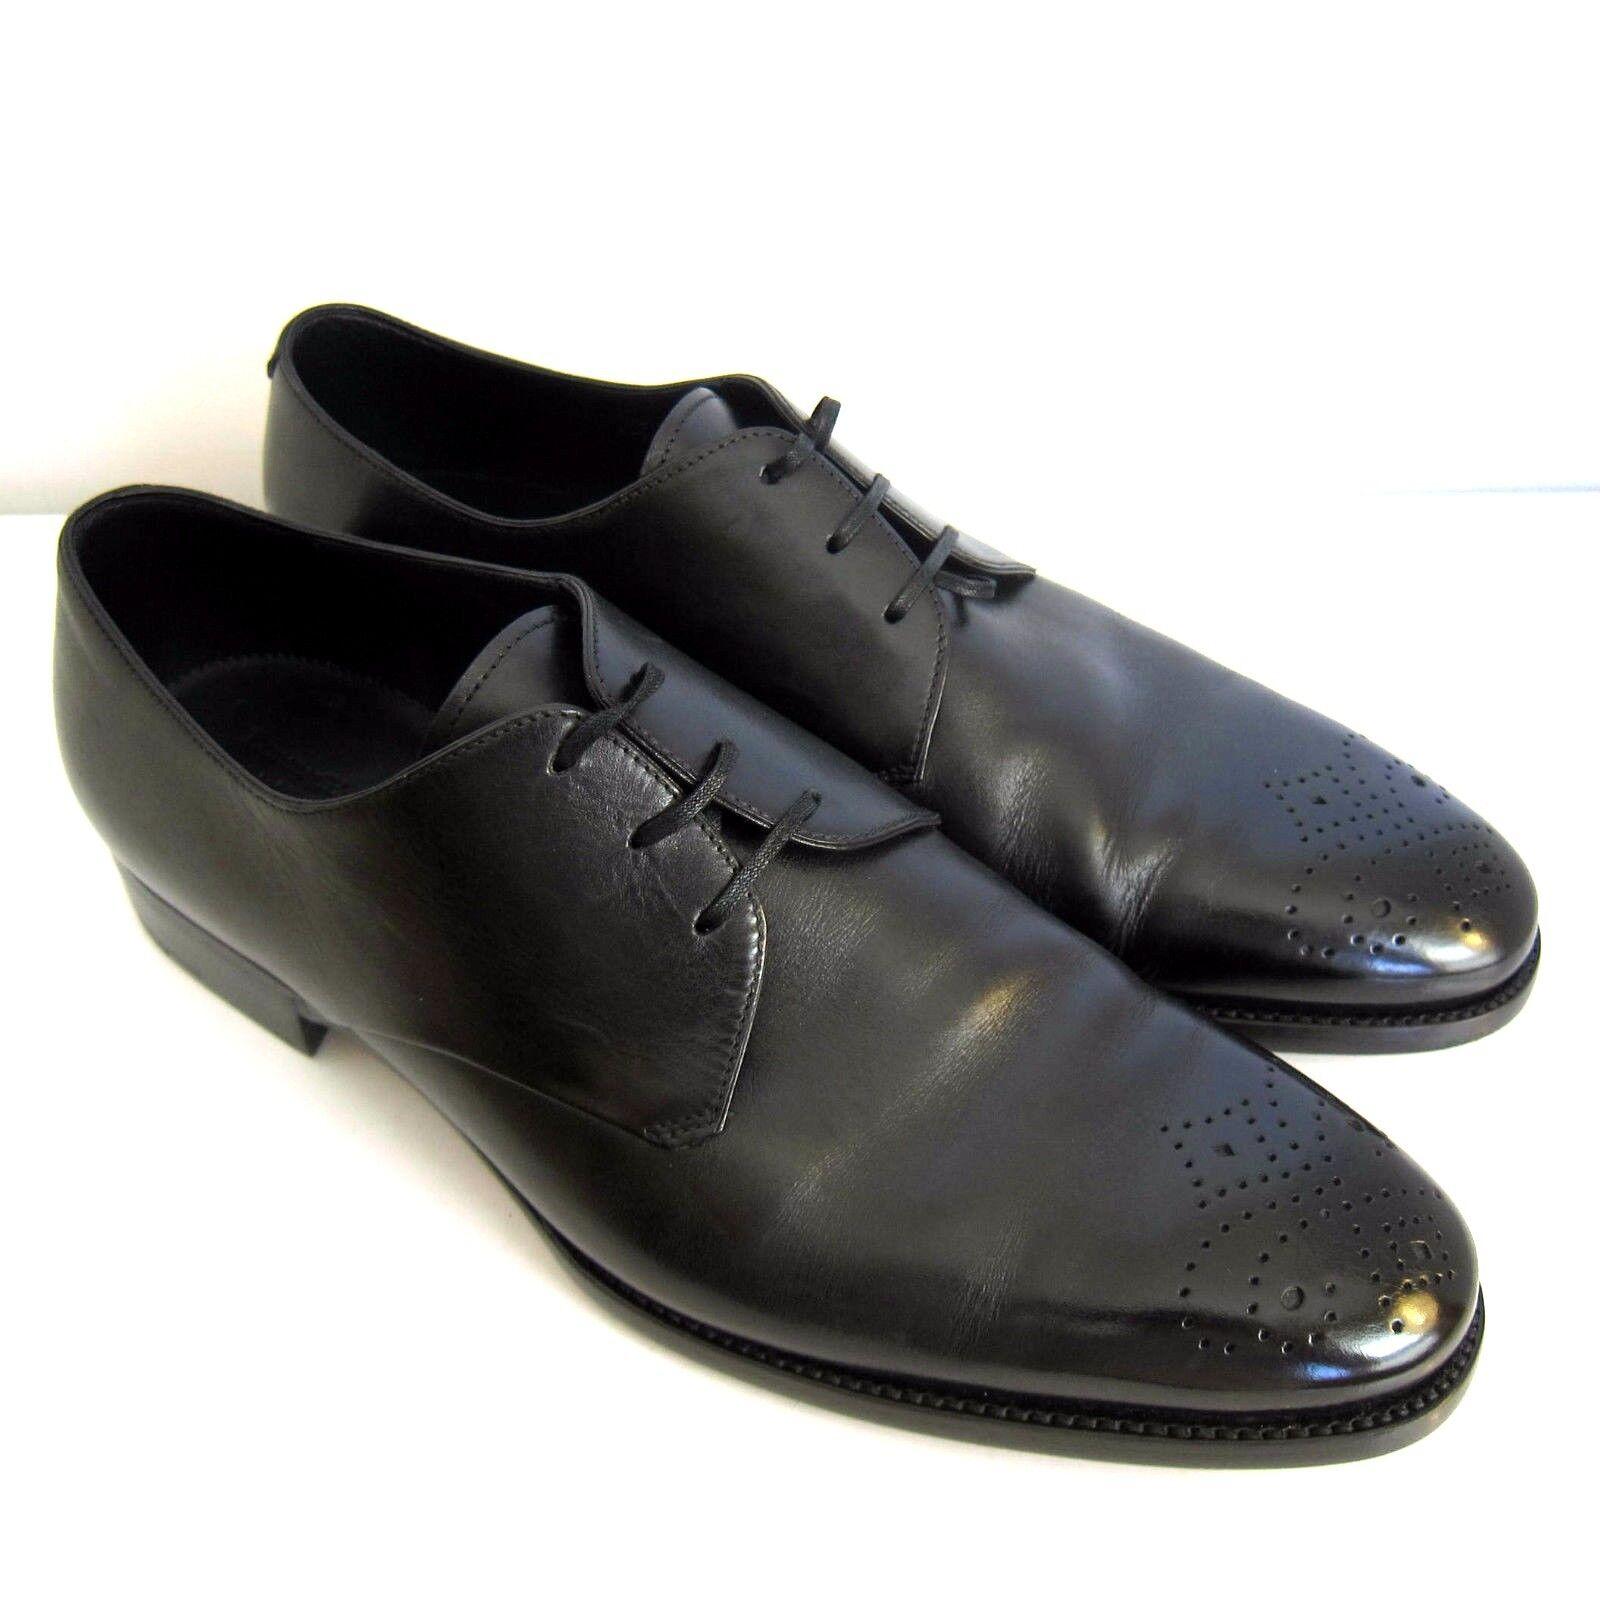 C-1329259 New Ermenegildo Zegna Leather Oxford scarpe Dimensione US 11.5D Marked 10.5EE